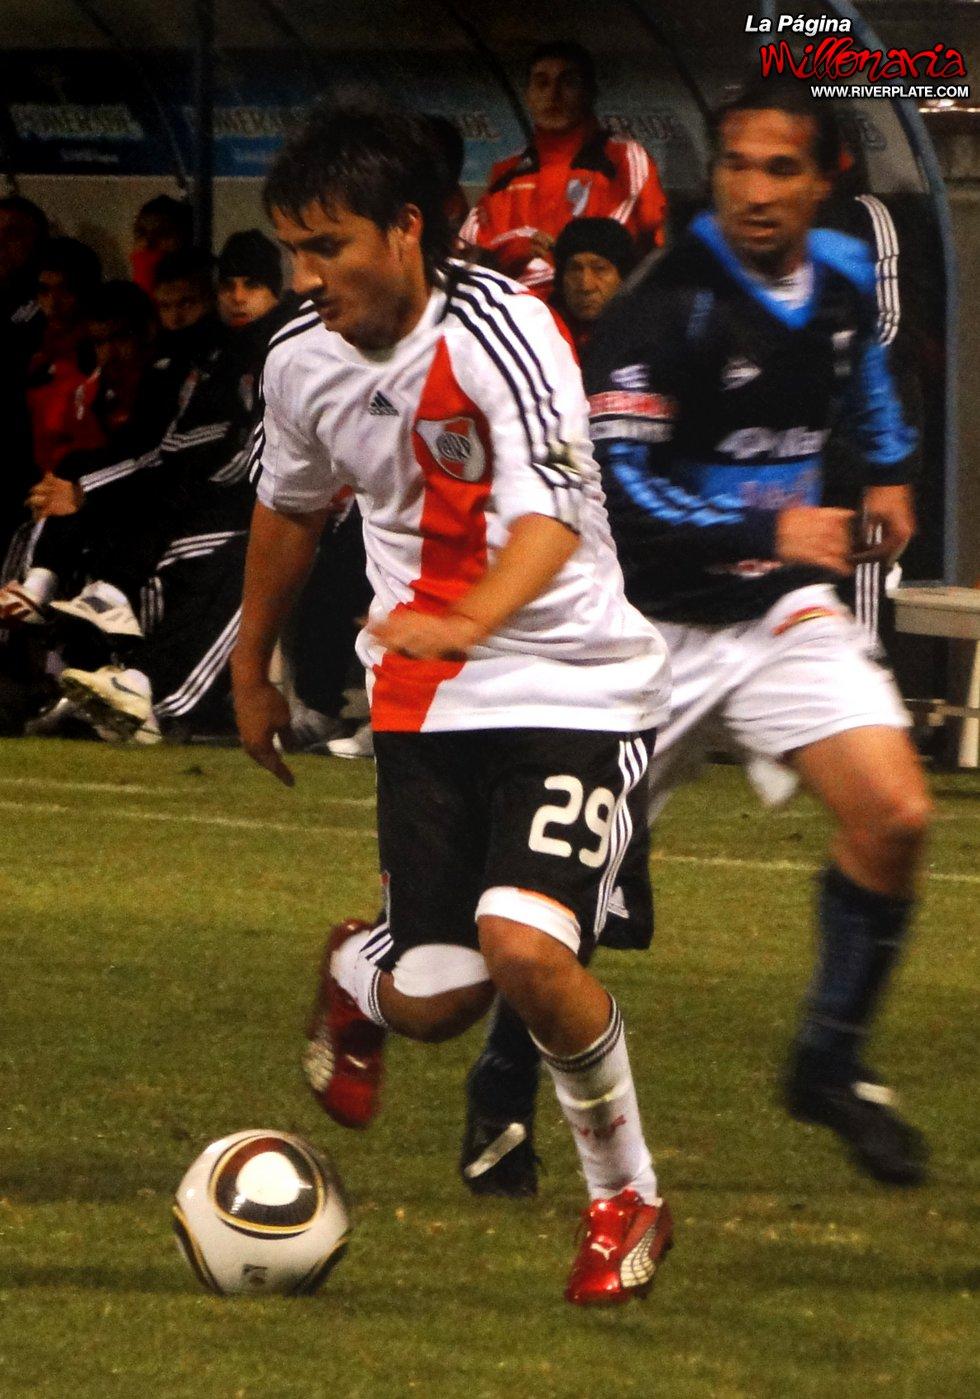 River Plate vs Gimnasia de Jujuy (Salta 2010) 82